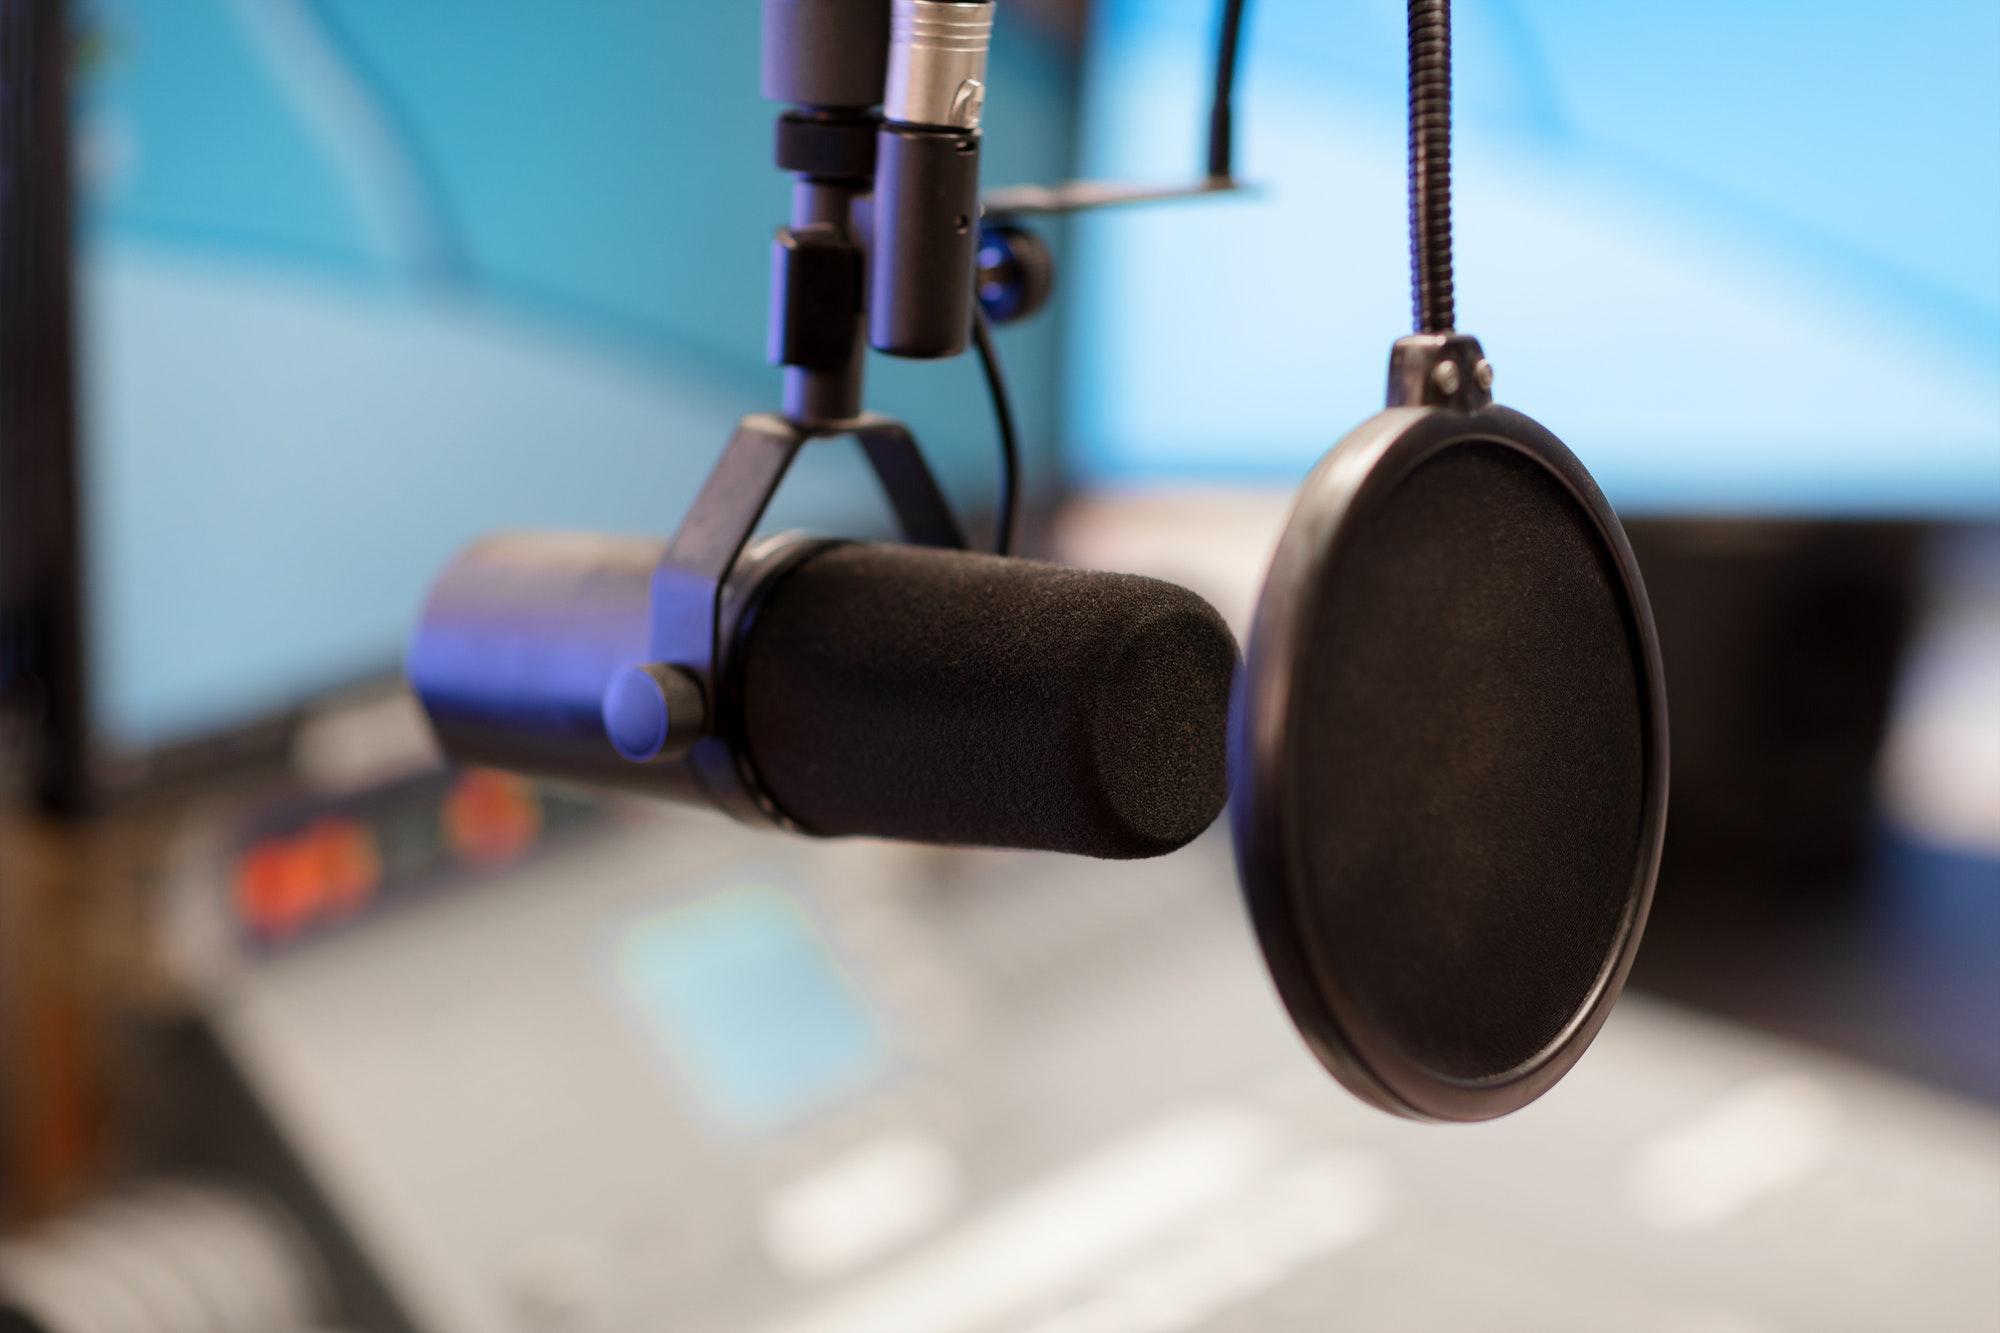 Microphone in modern radio station broadcasting studio